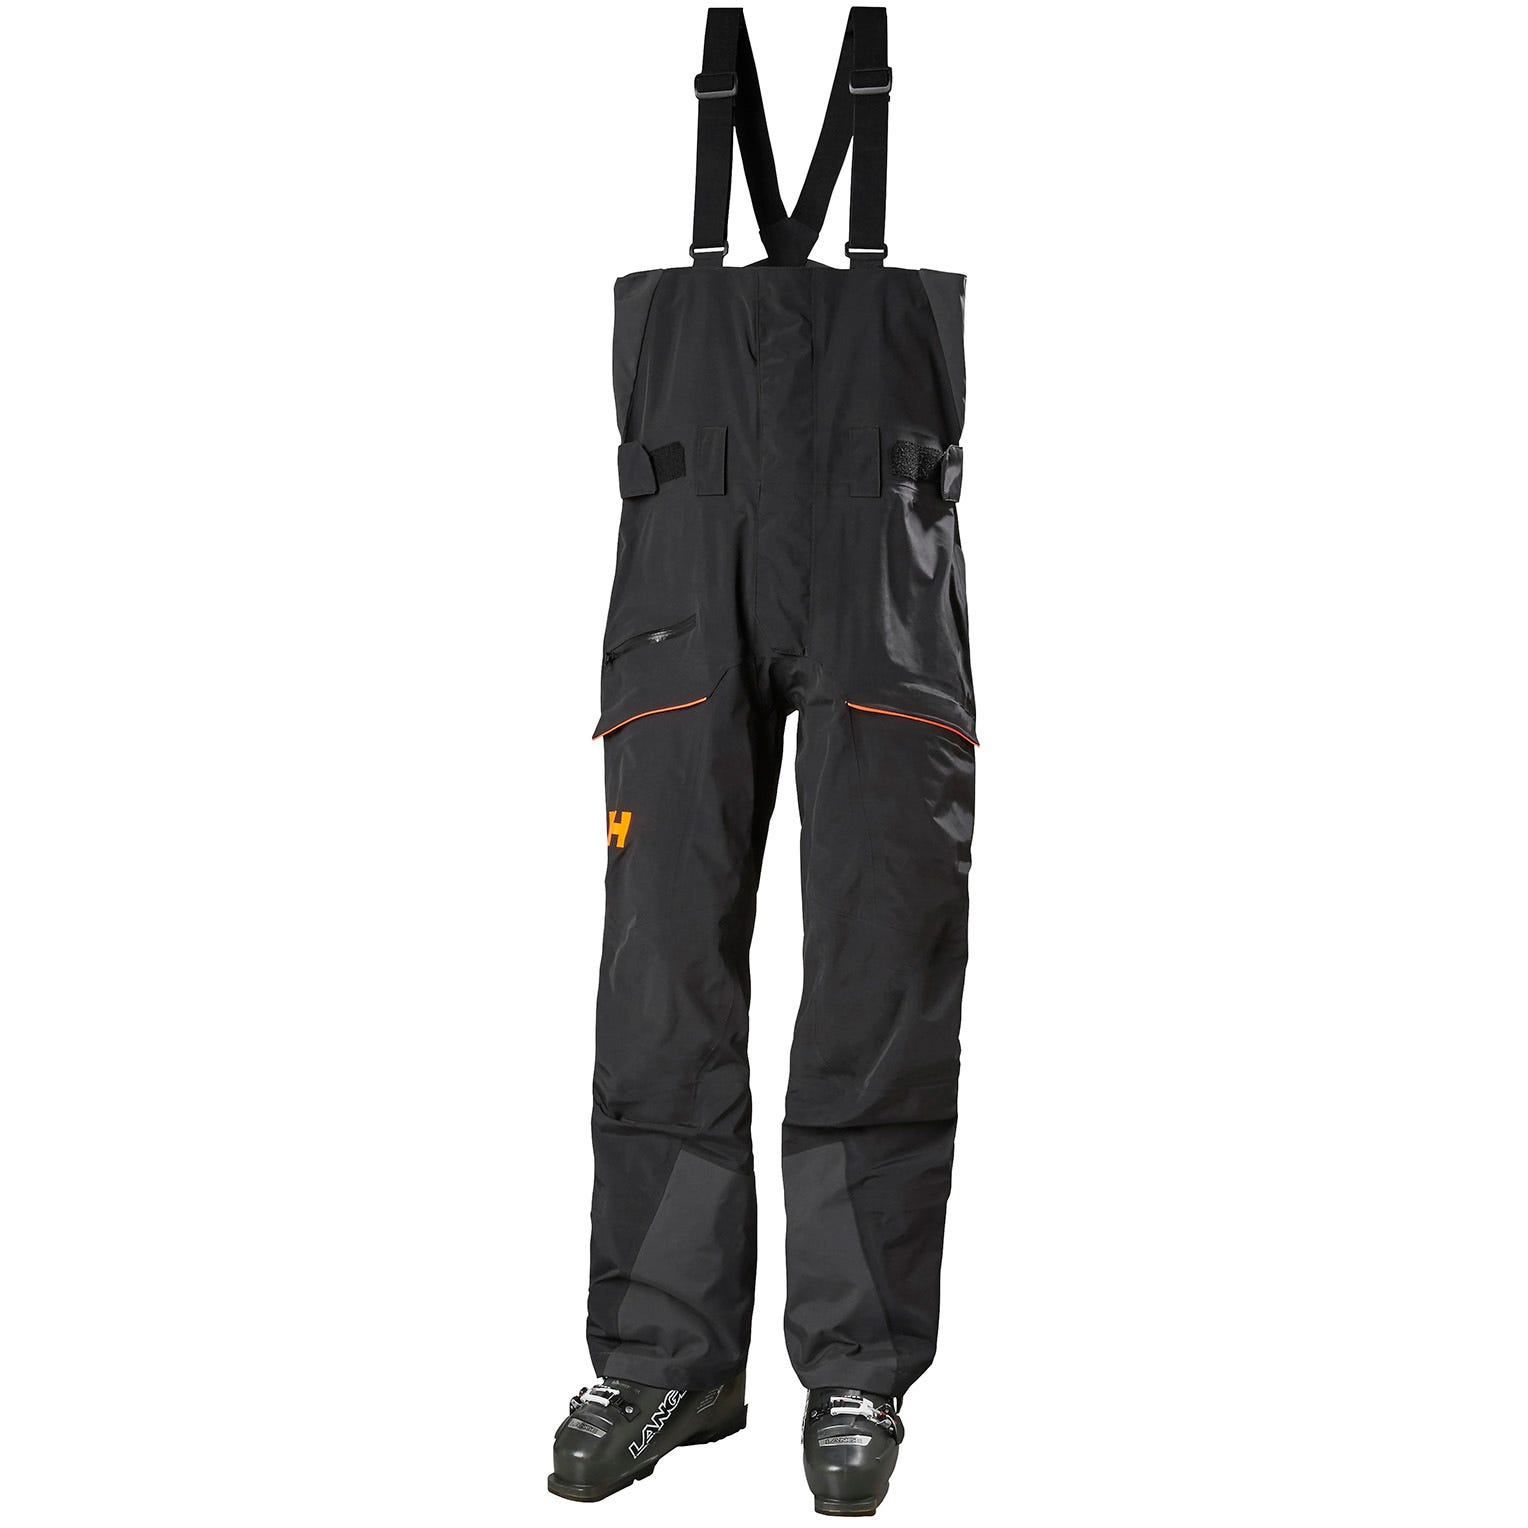 Helly Hansen Mens Sogn Bib Shell Ski Trousers Black XL